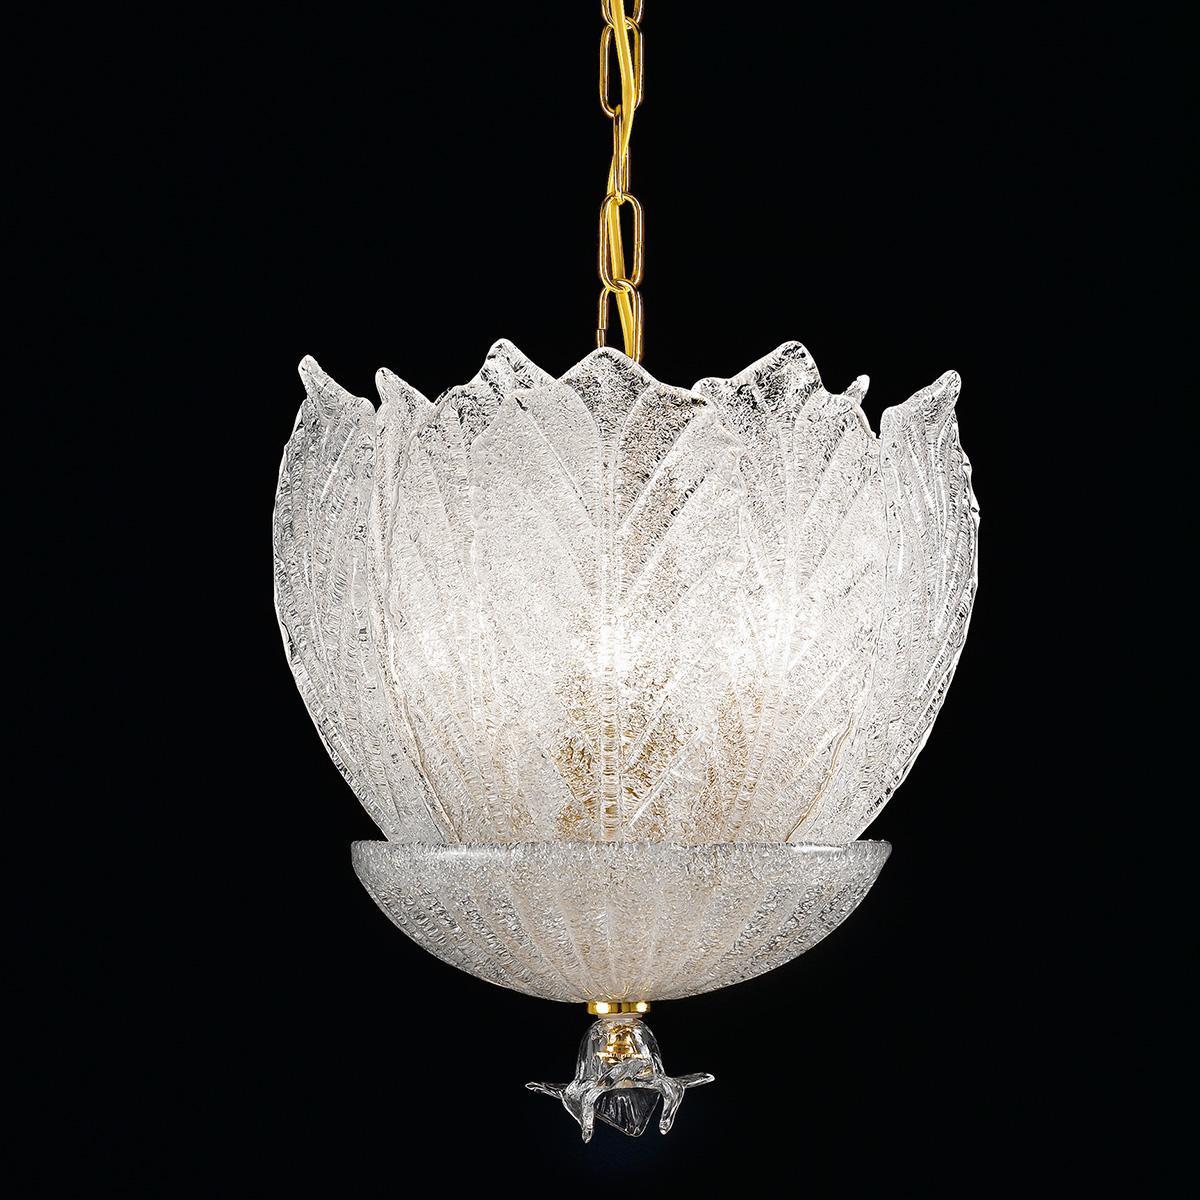 """Luigia"" Murano glass pendant light - 5 lights - ""rugiada"" transparent"